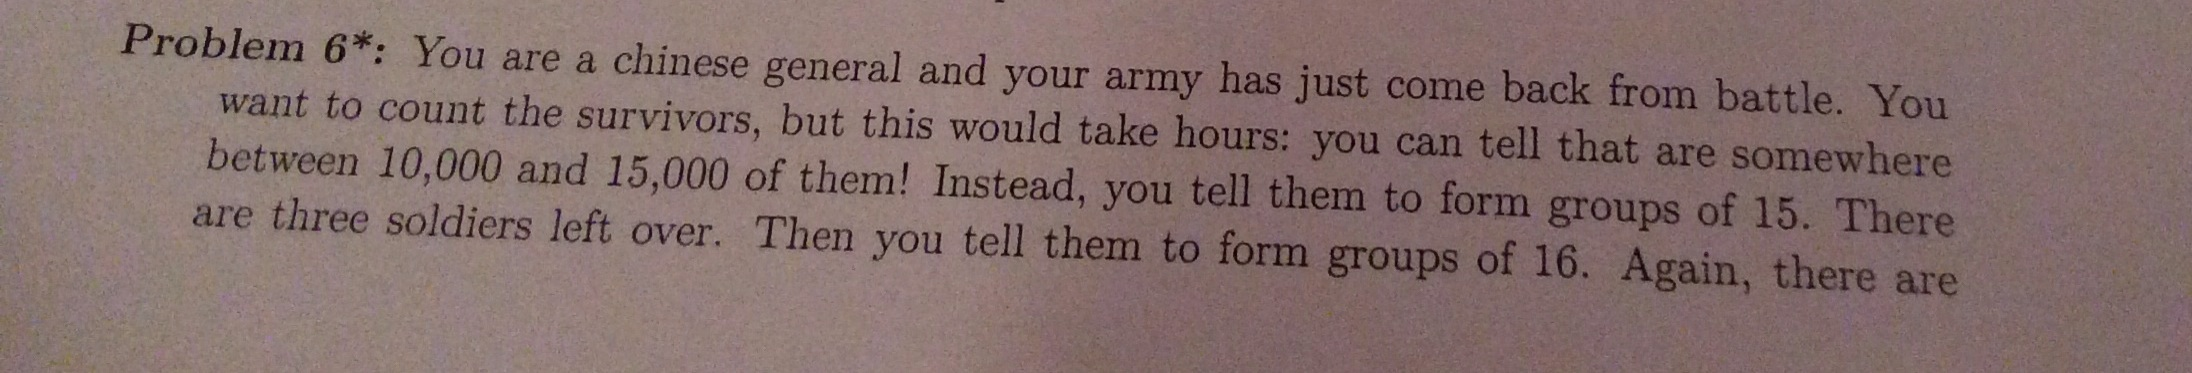 mandatory military service argumentative essay